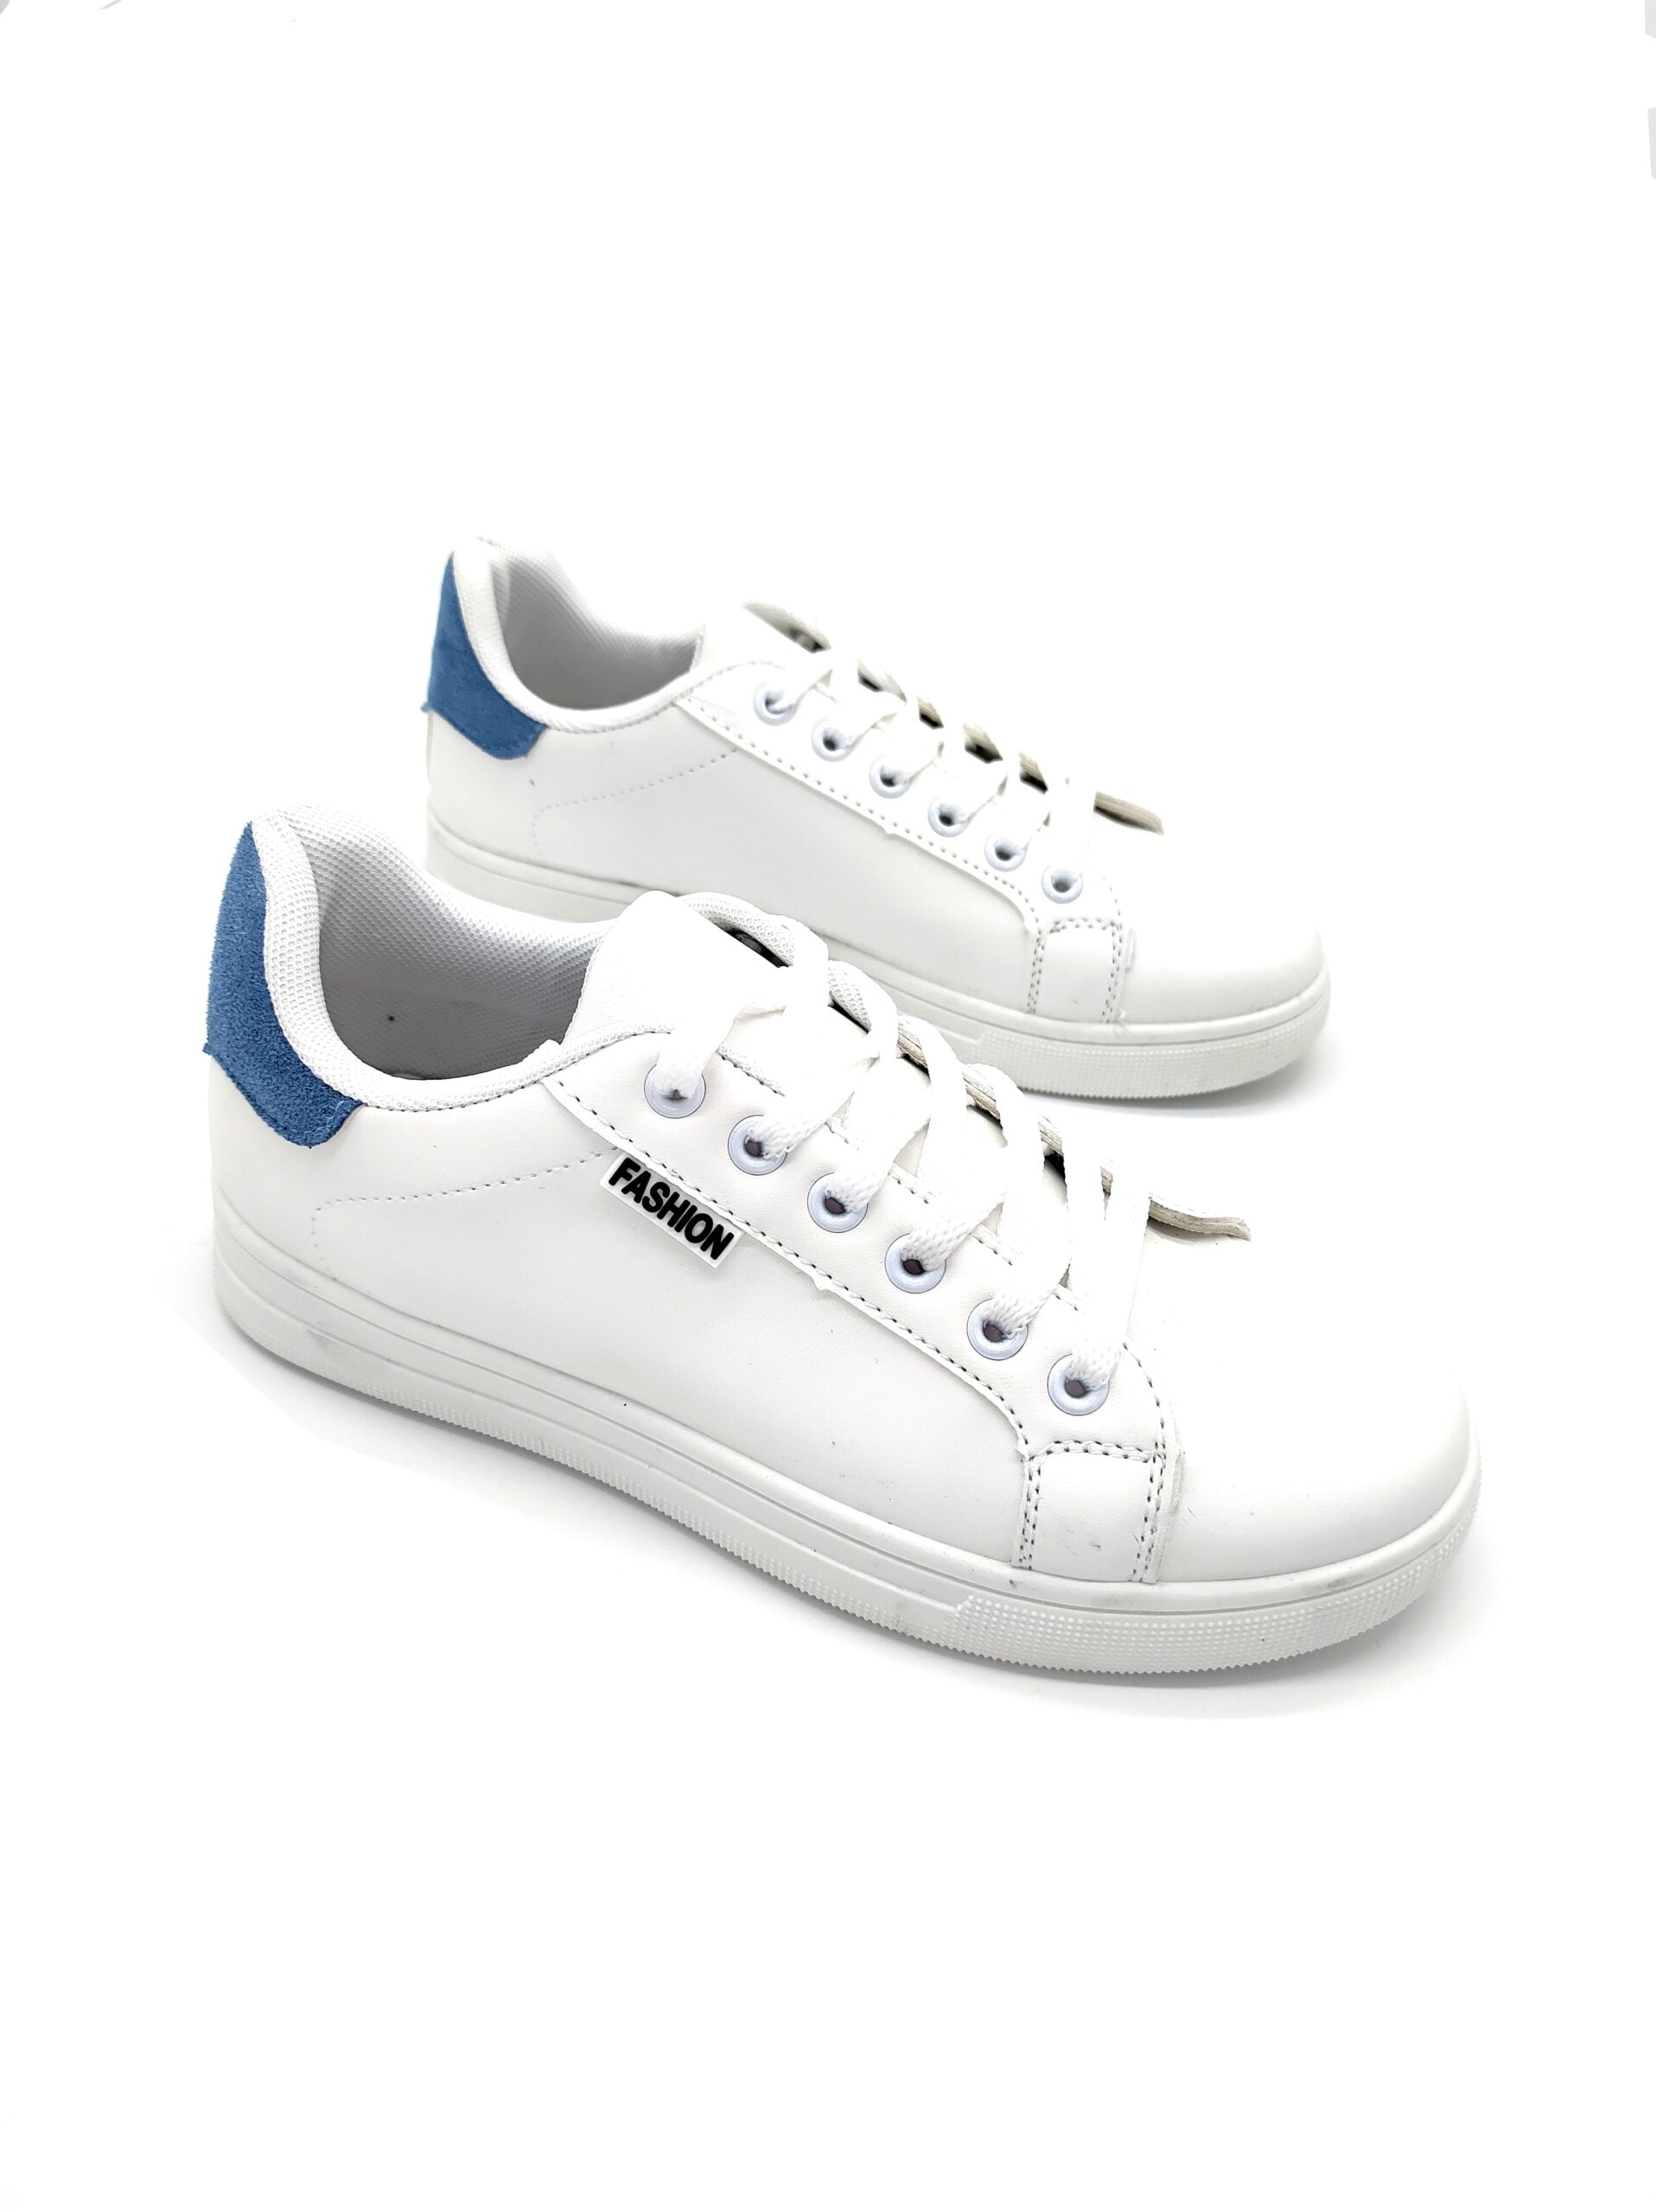 Sneakers Basic με Μπλε Λεπτομέρειες